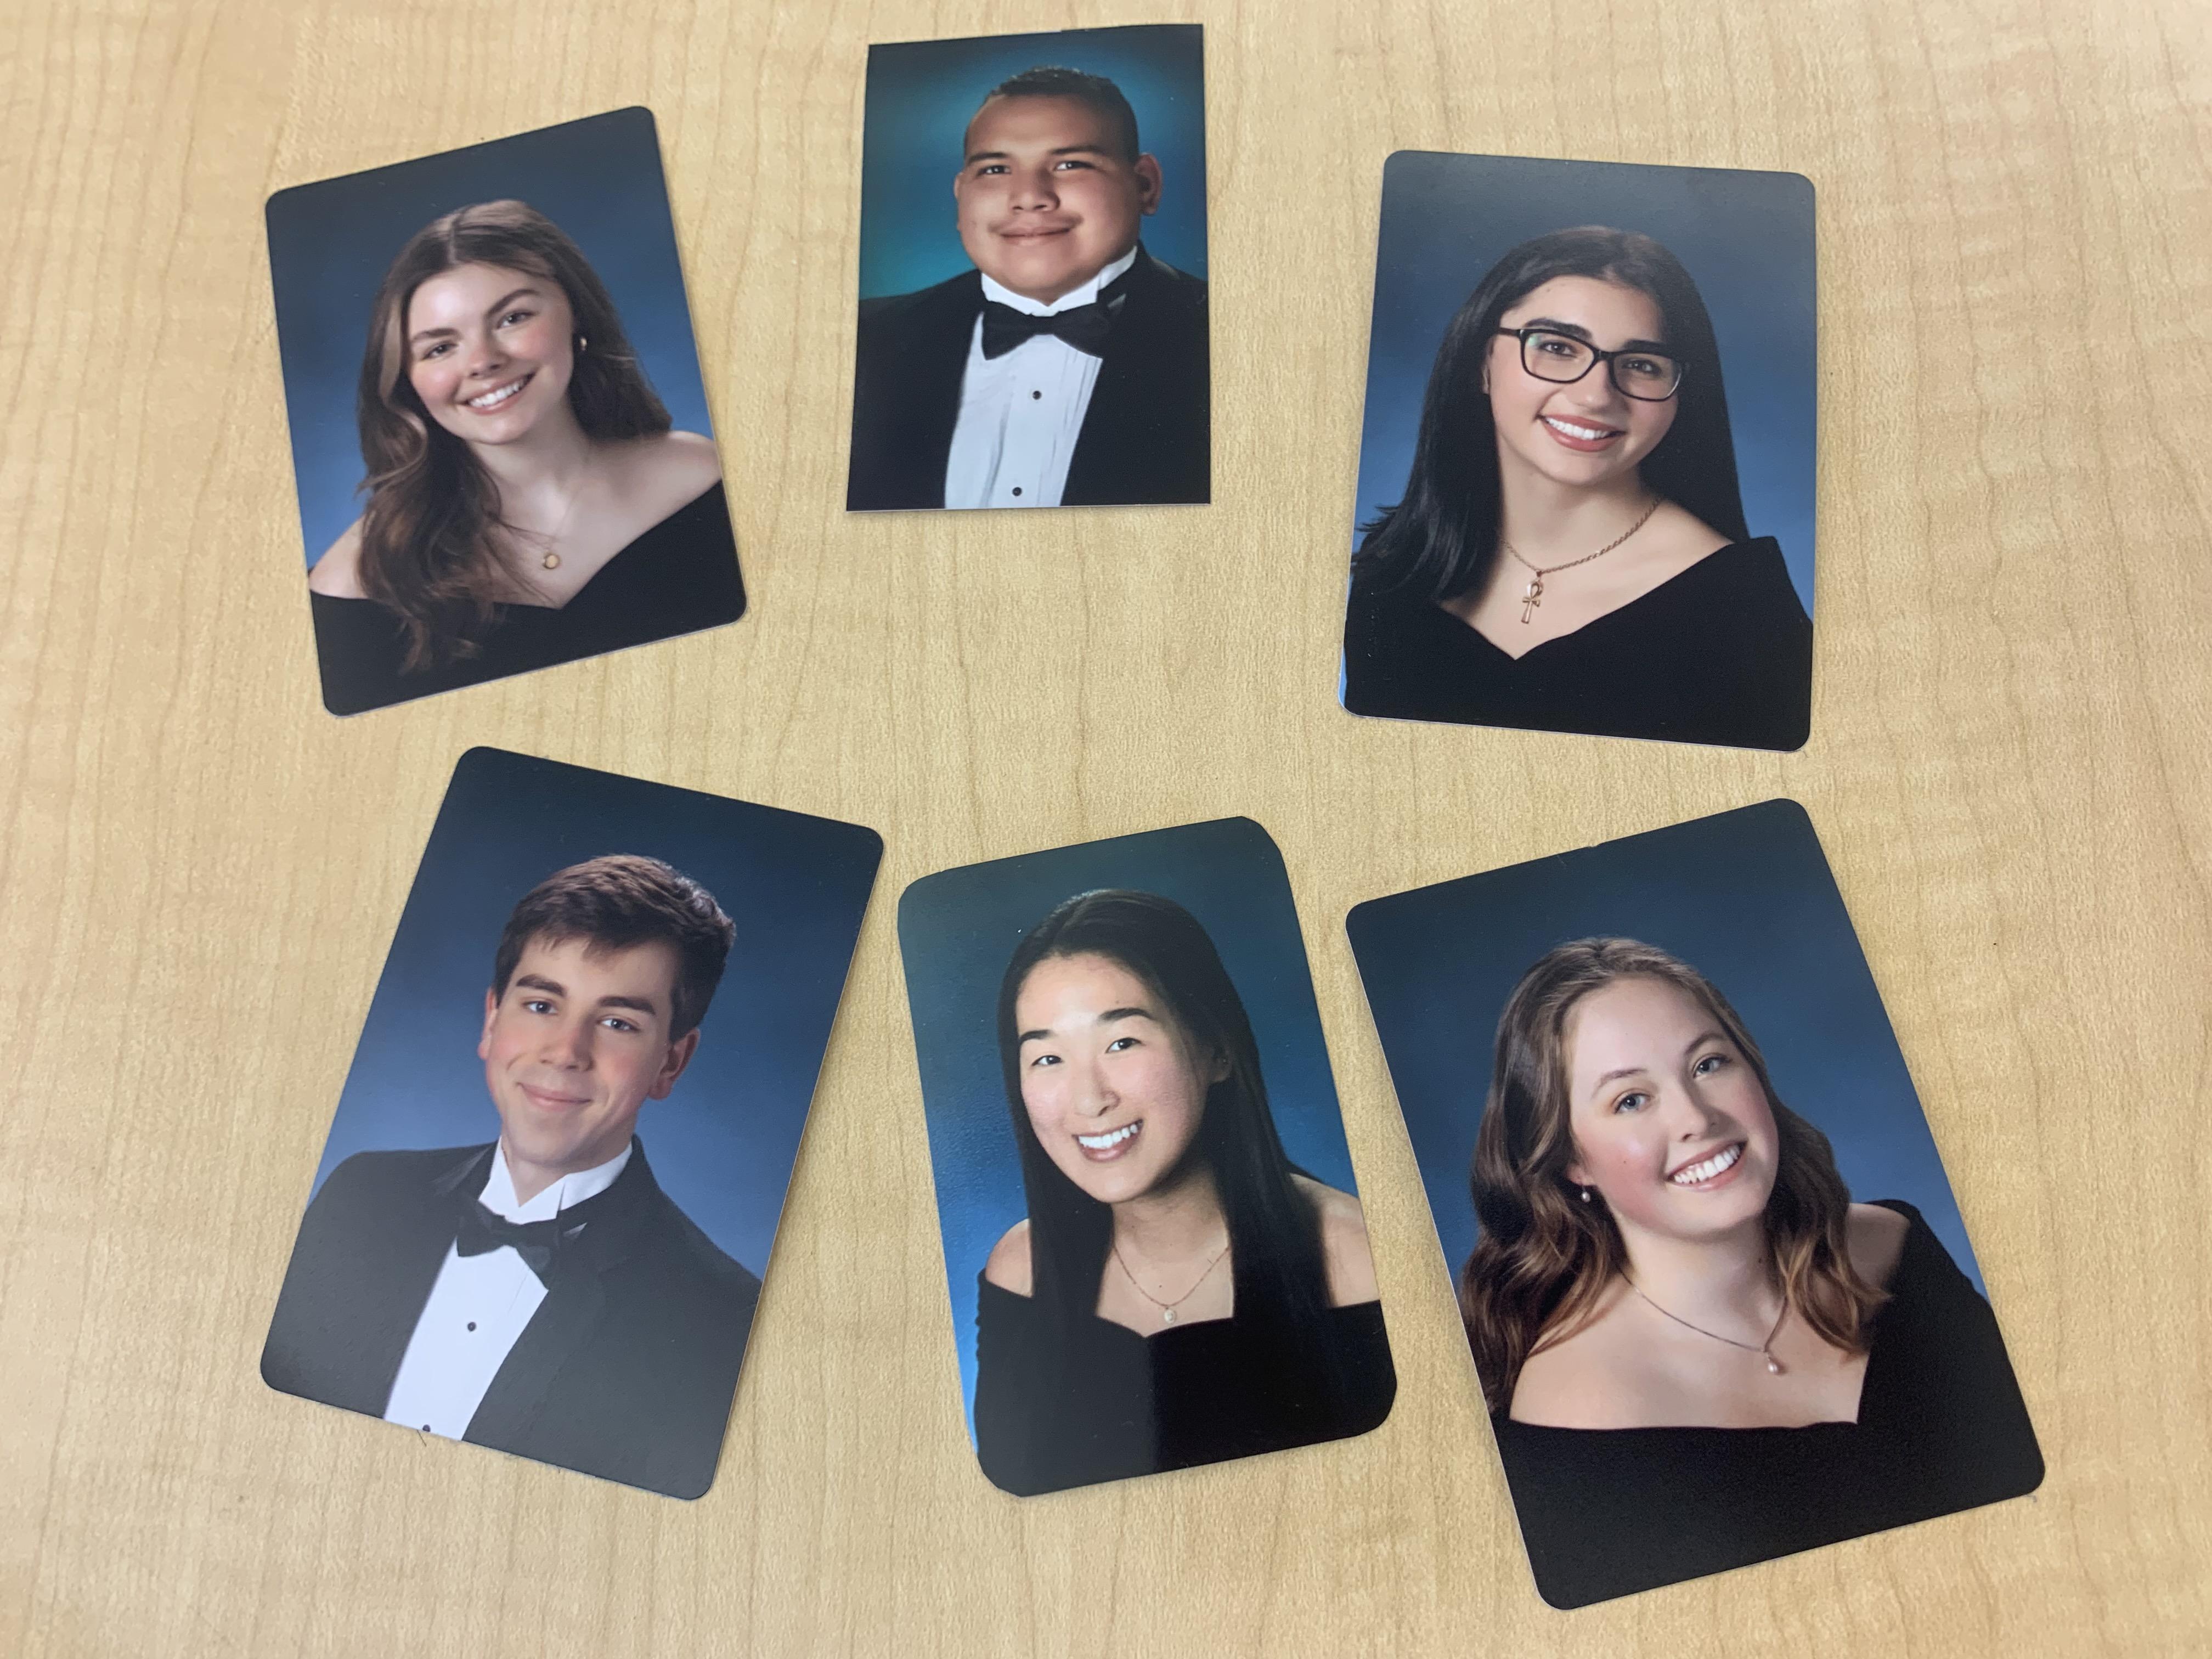 Our Binary Portraits